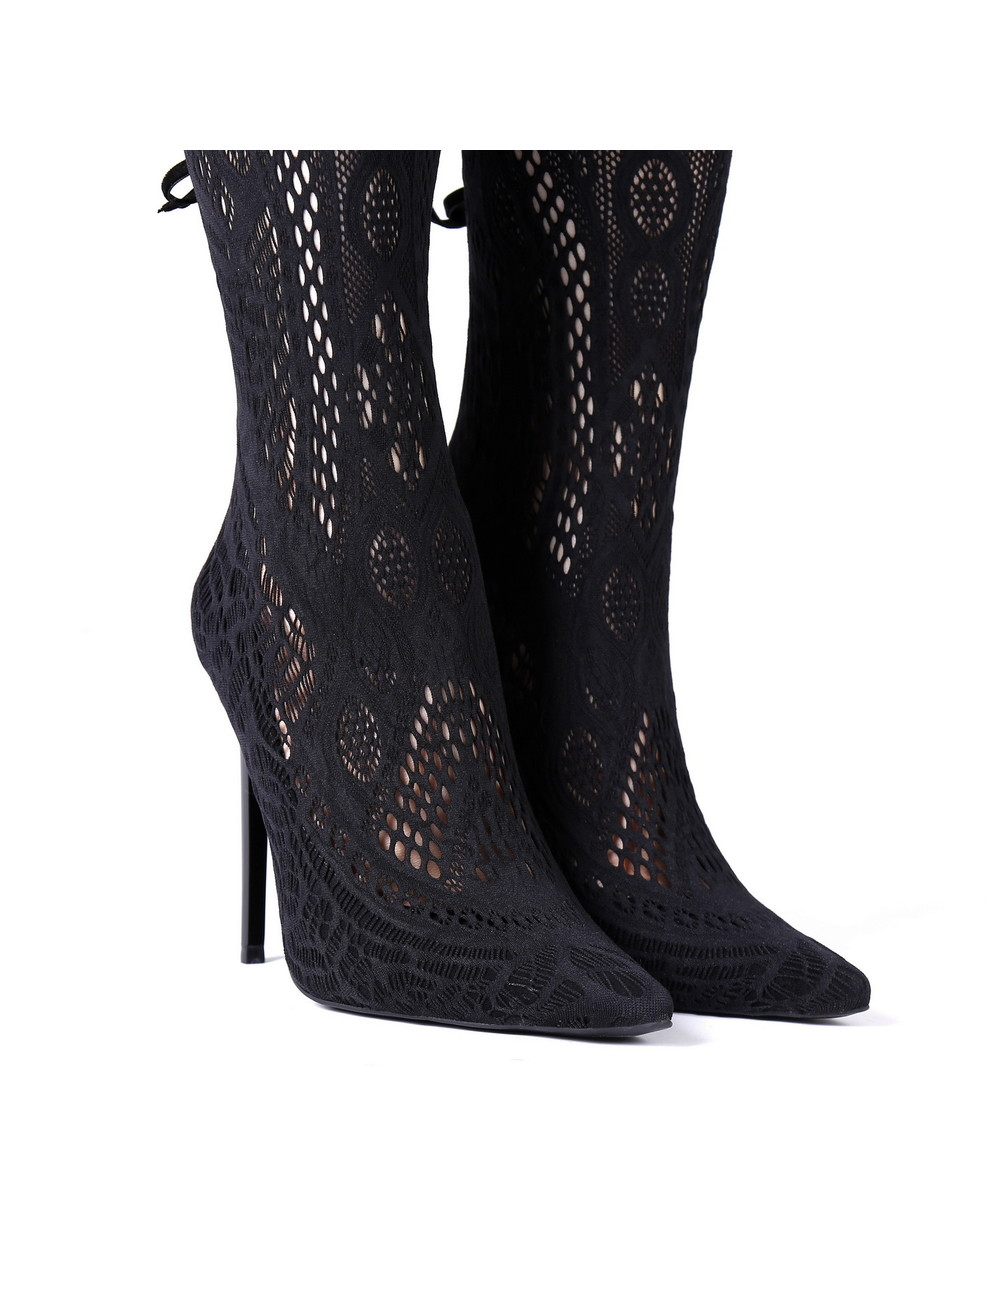 Giaro SARAFINA | BLACK  | THIGH BOOTS | Italian Style